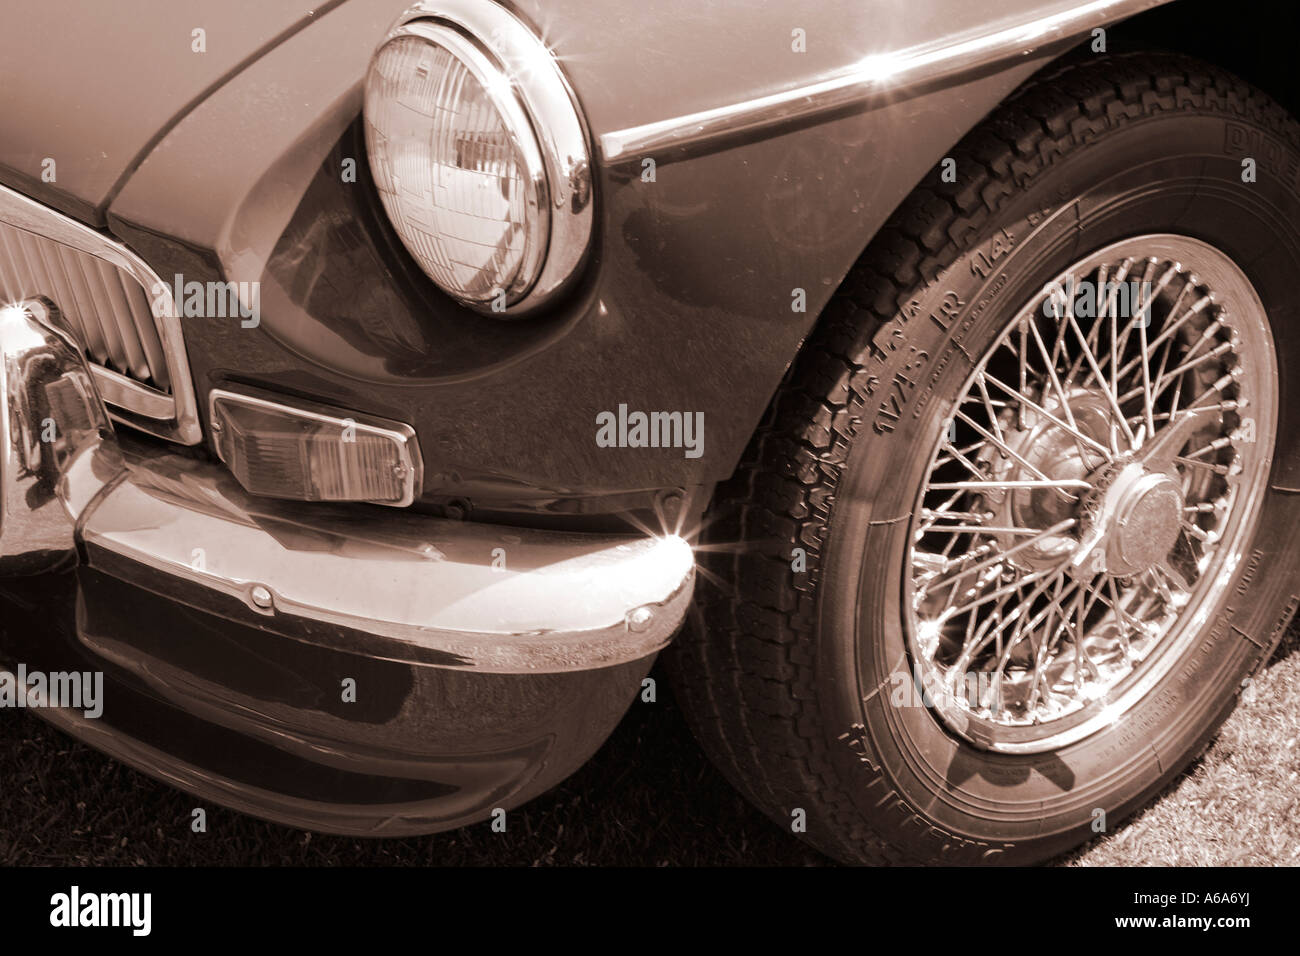 Chrome Car Wheels Stock Photos Chrome Car Wheels Stock Images Alamy - Classic car wheels